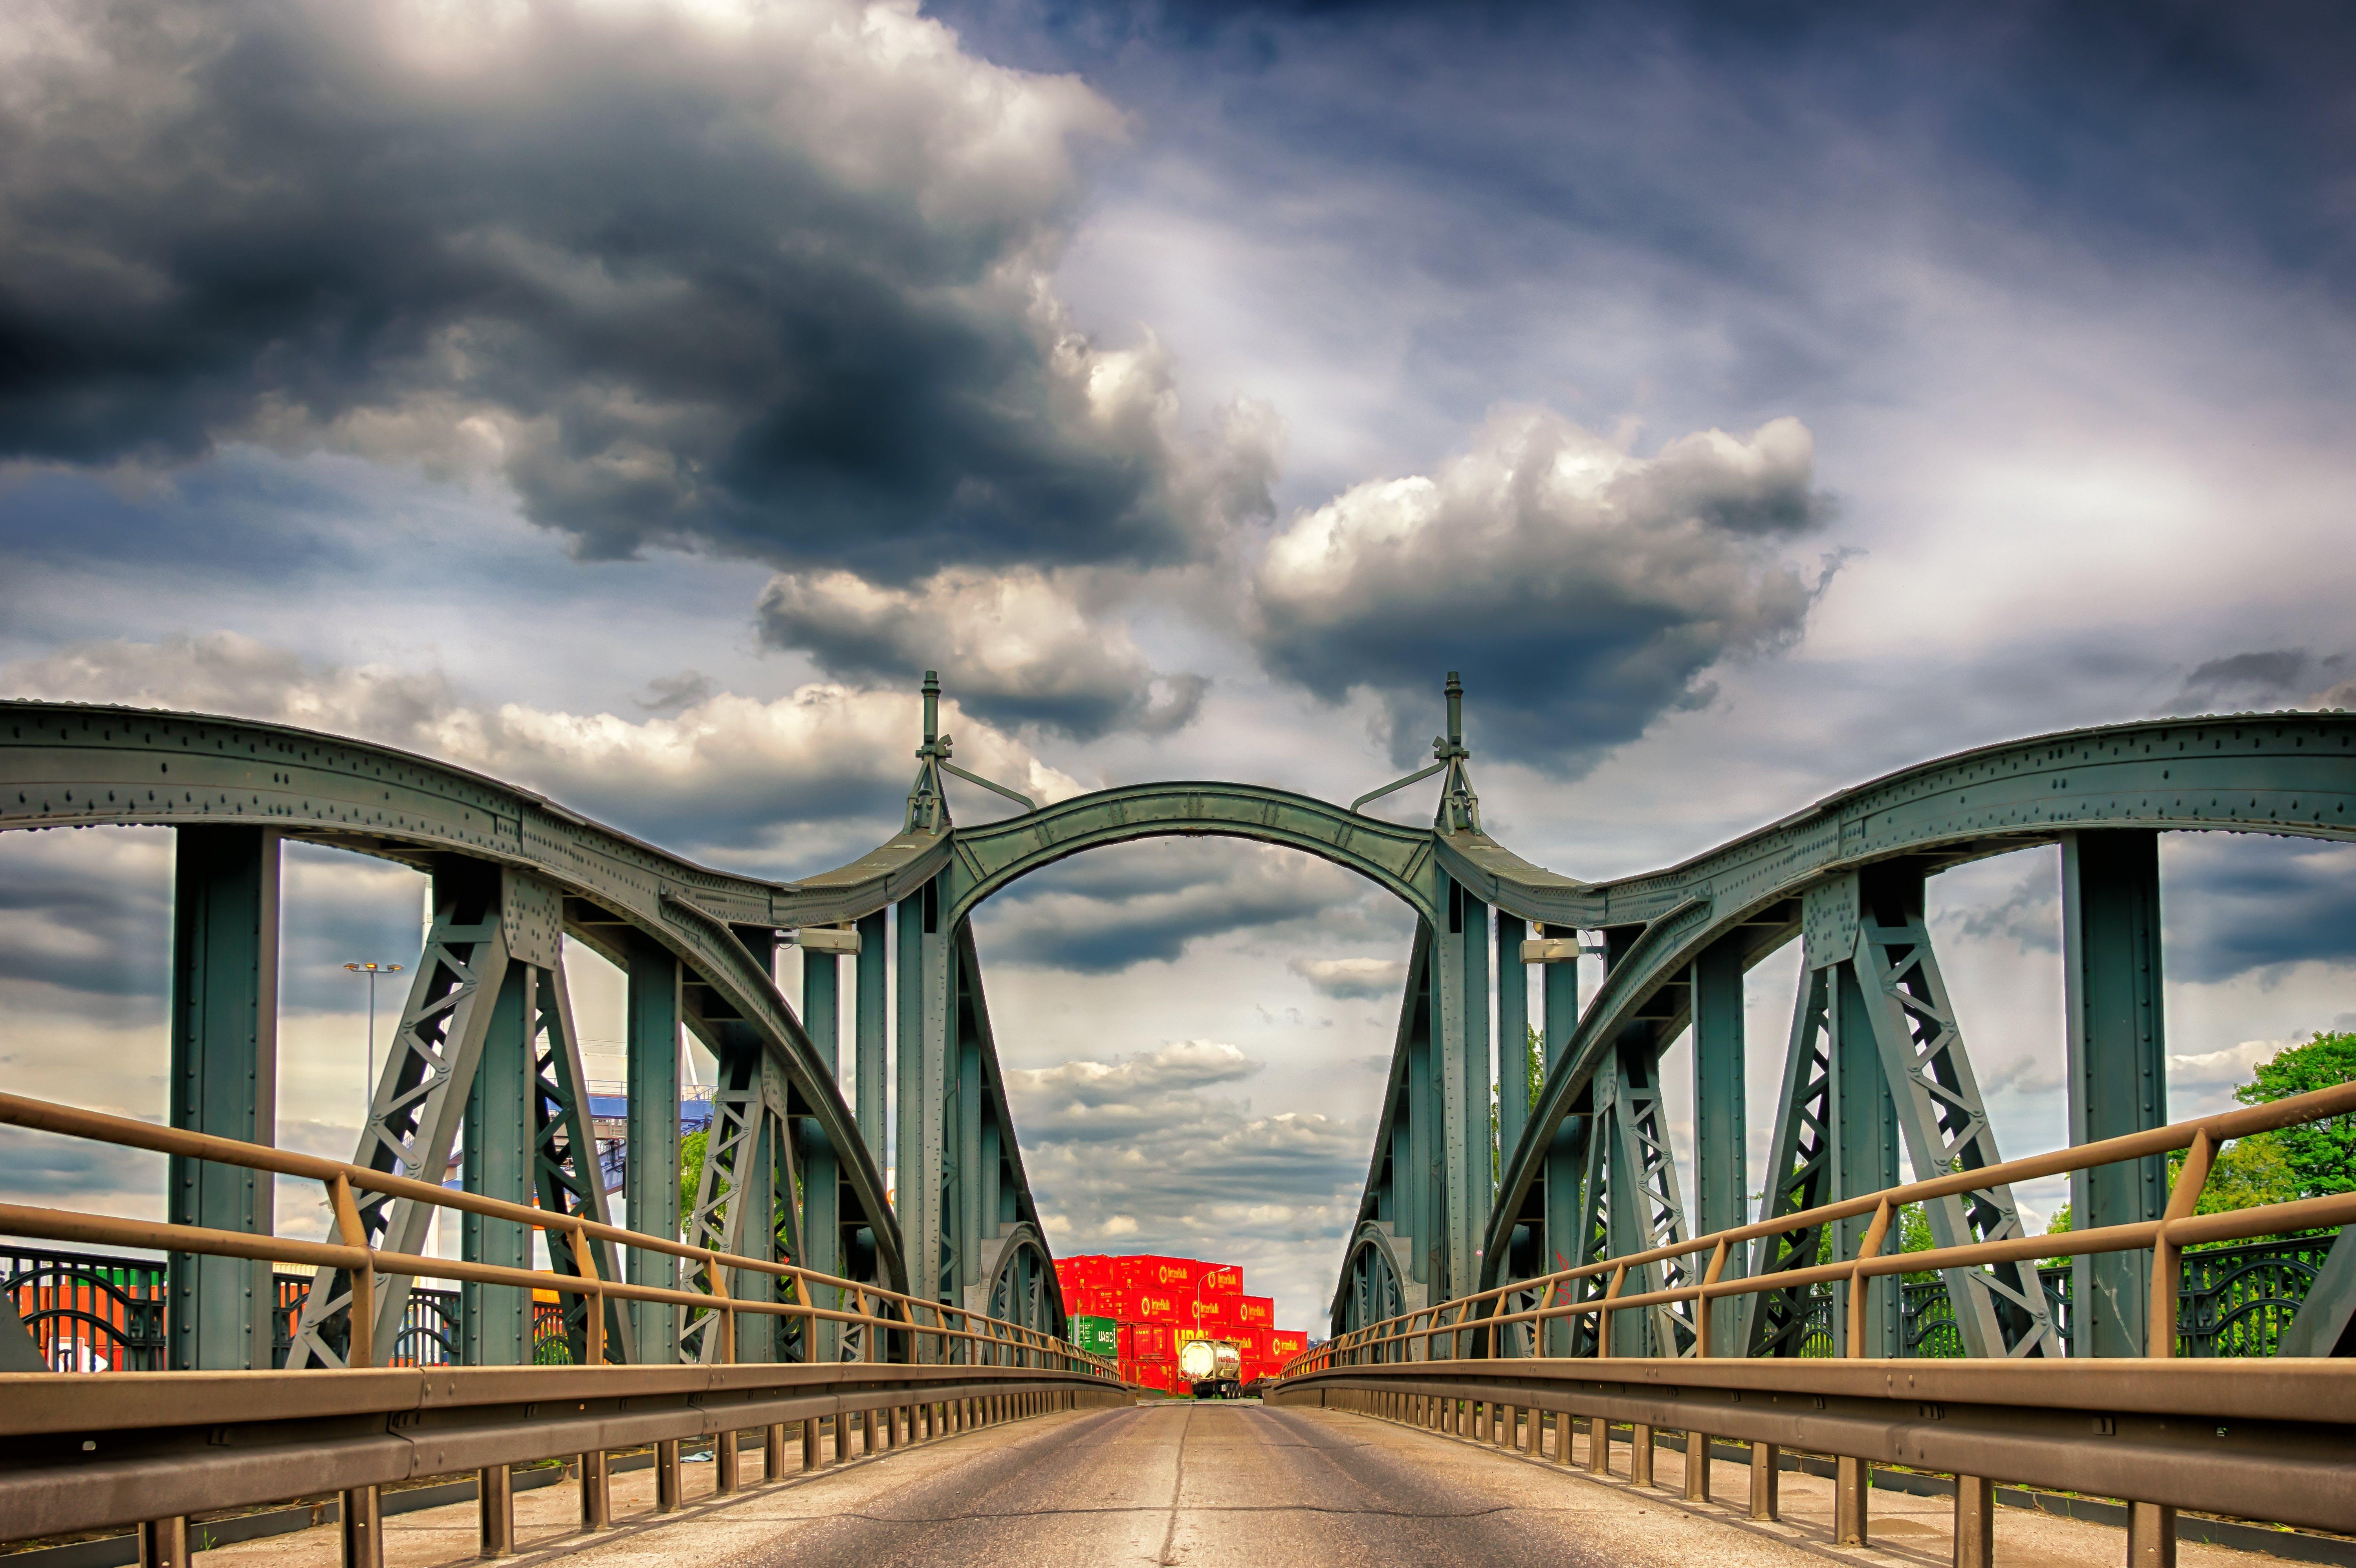 asphalt, bridge, city